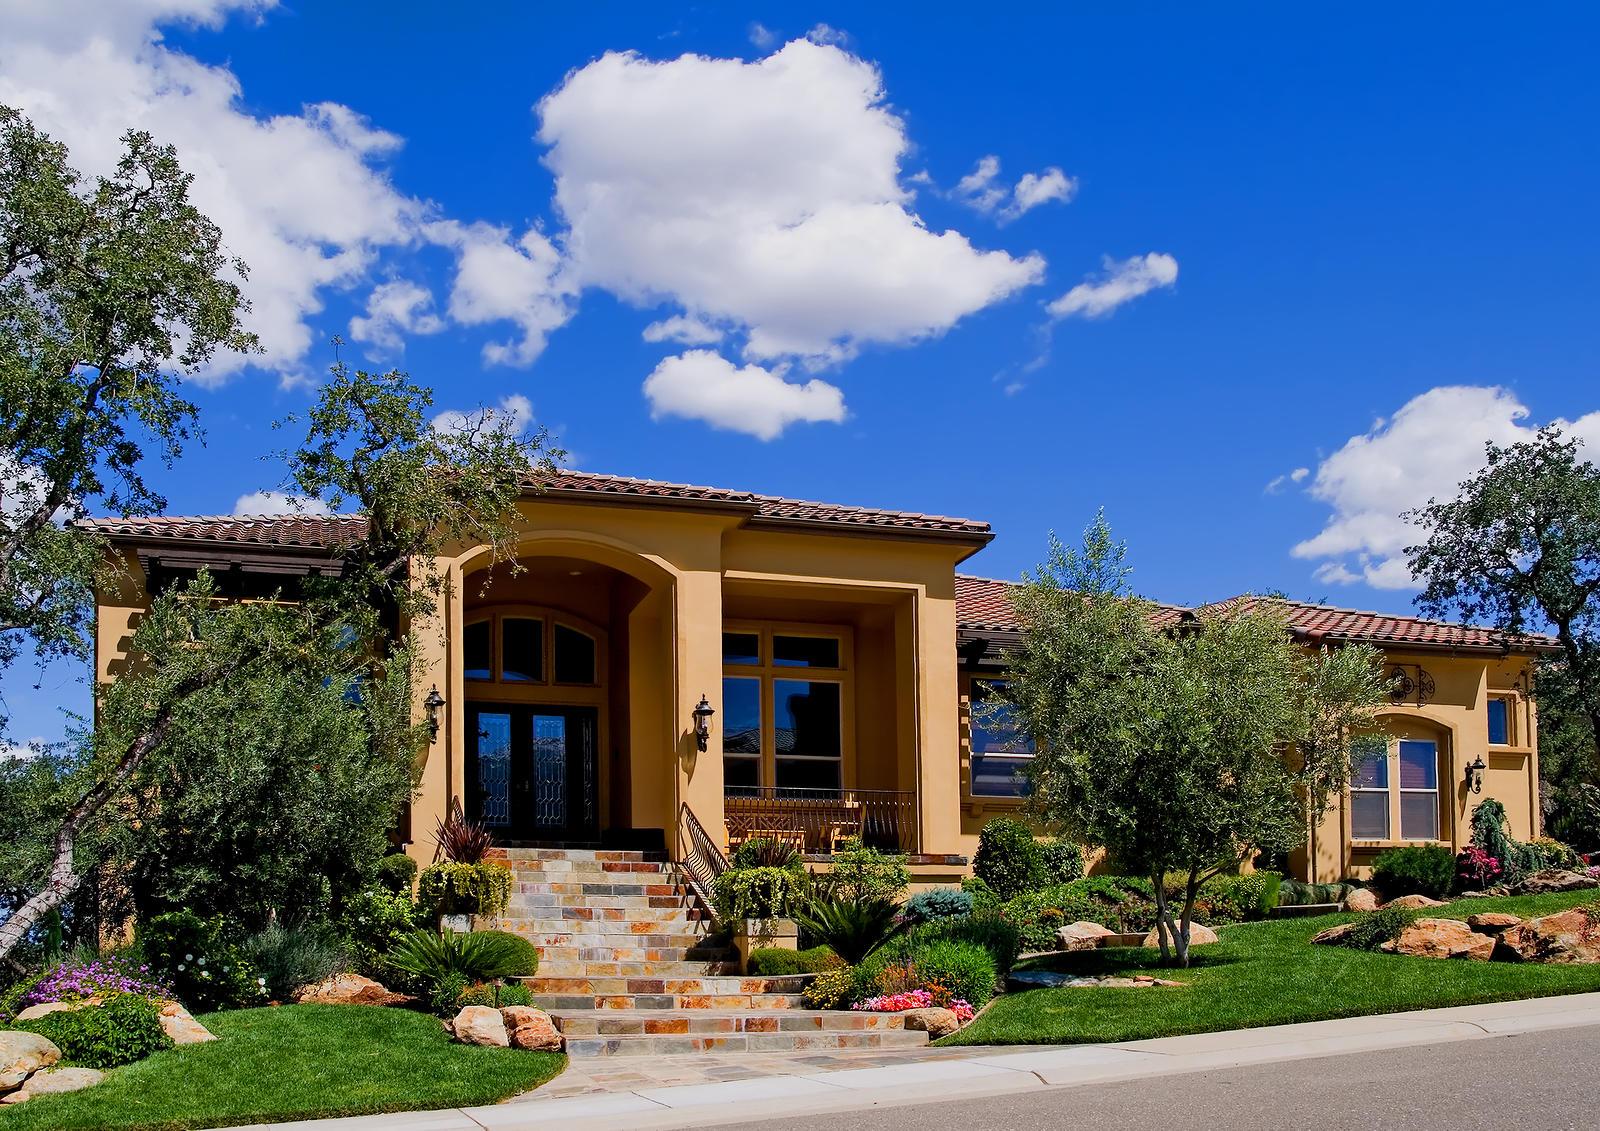 Arpad Racz - San Jose Real Estate Agent & Realtor